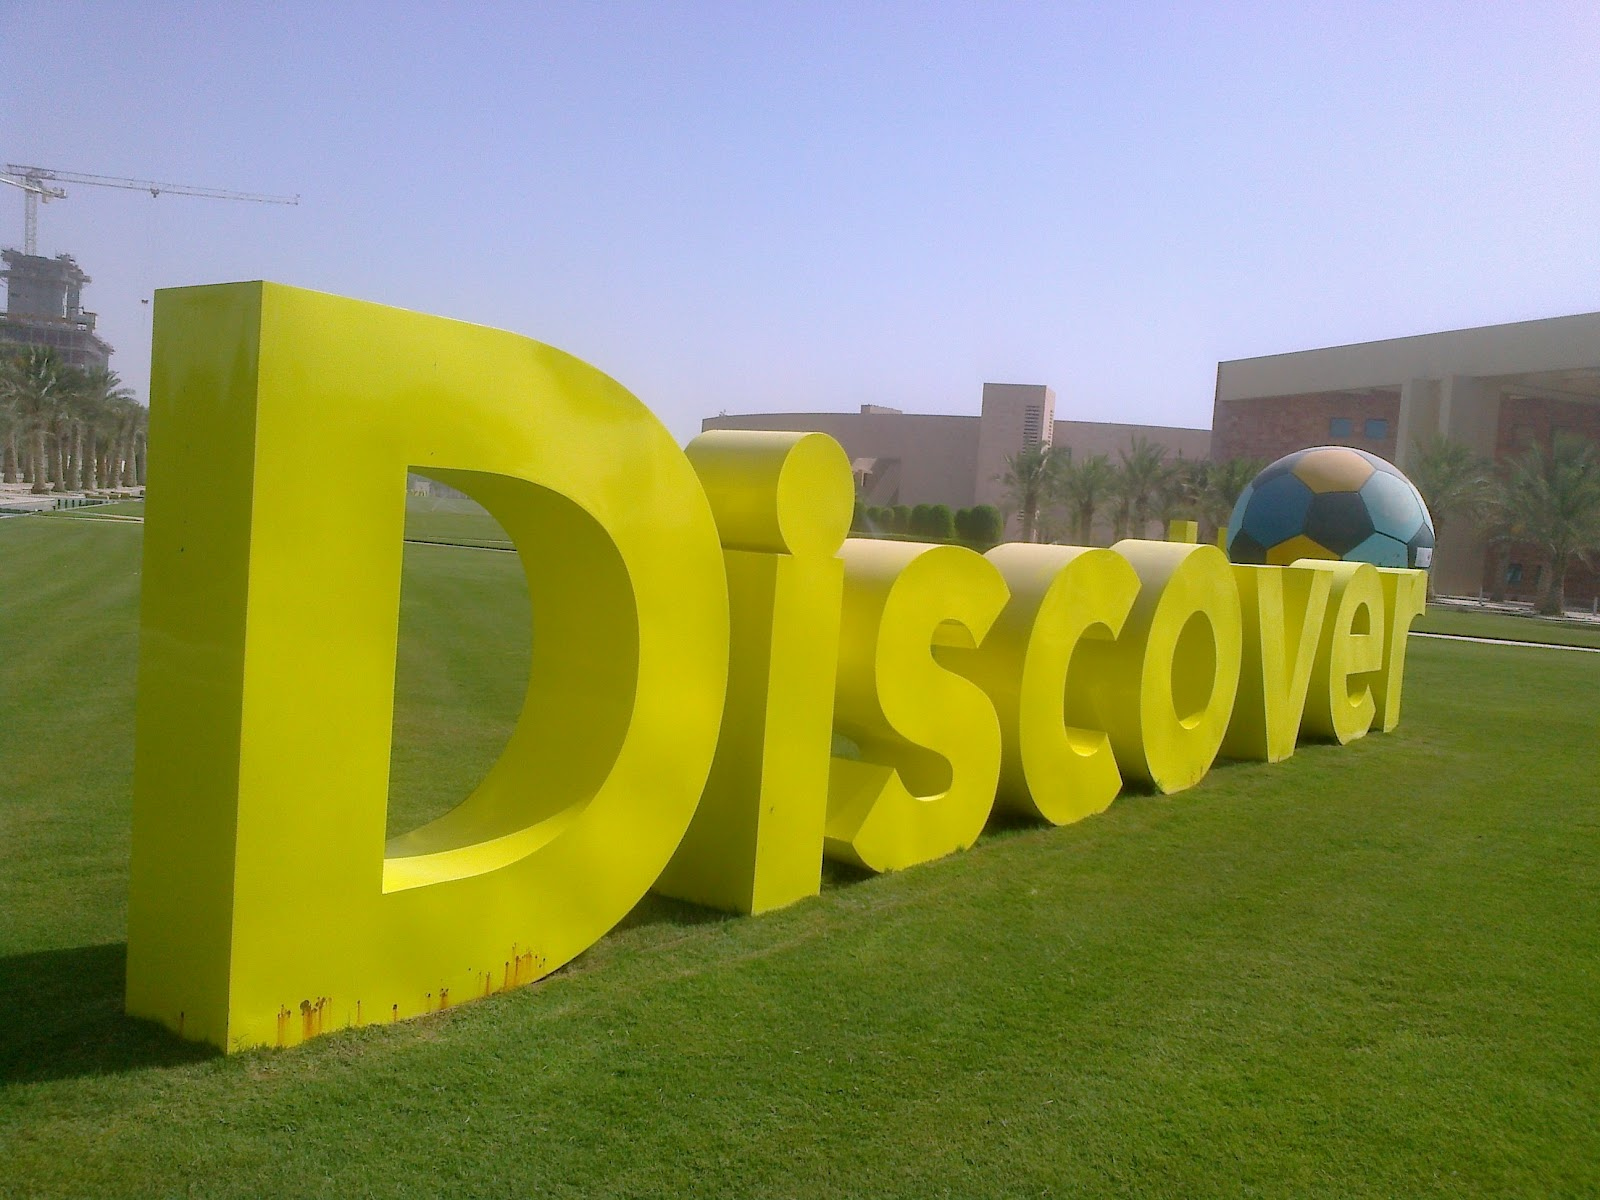 Education City Doha, Qatar describes Qatar's love and future intention ...